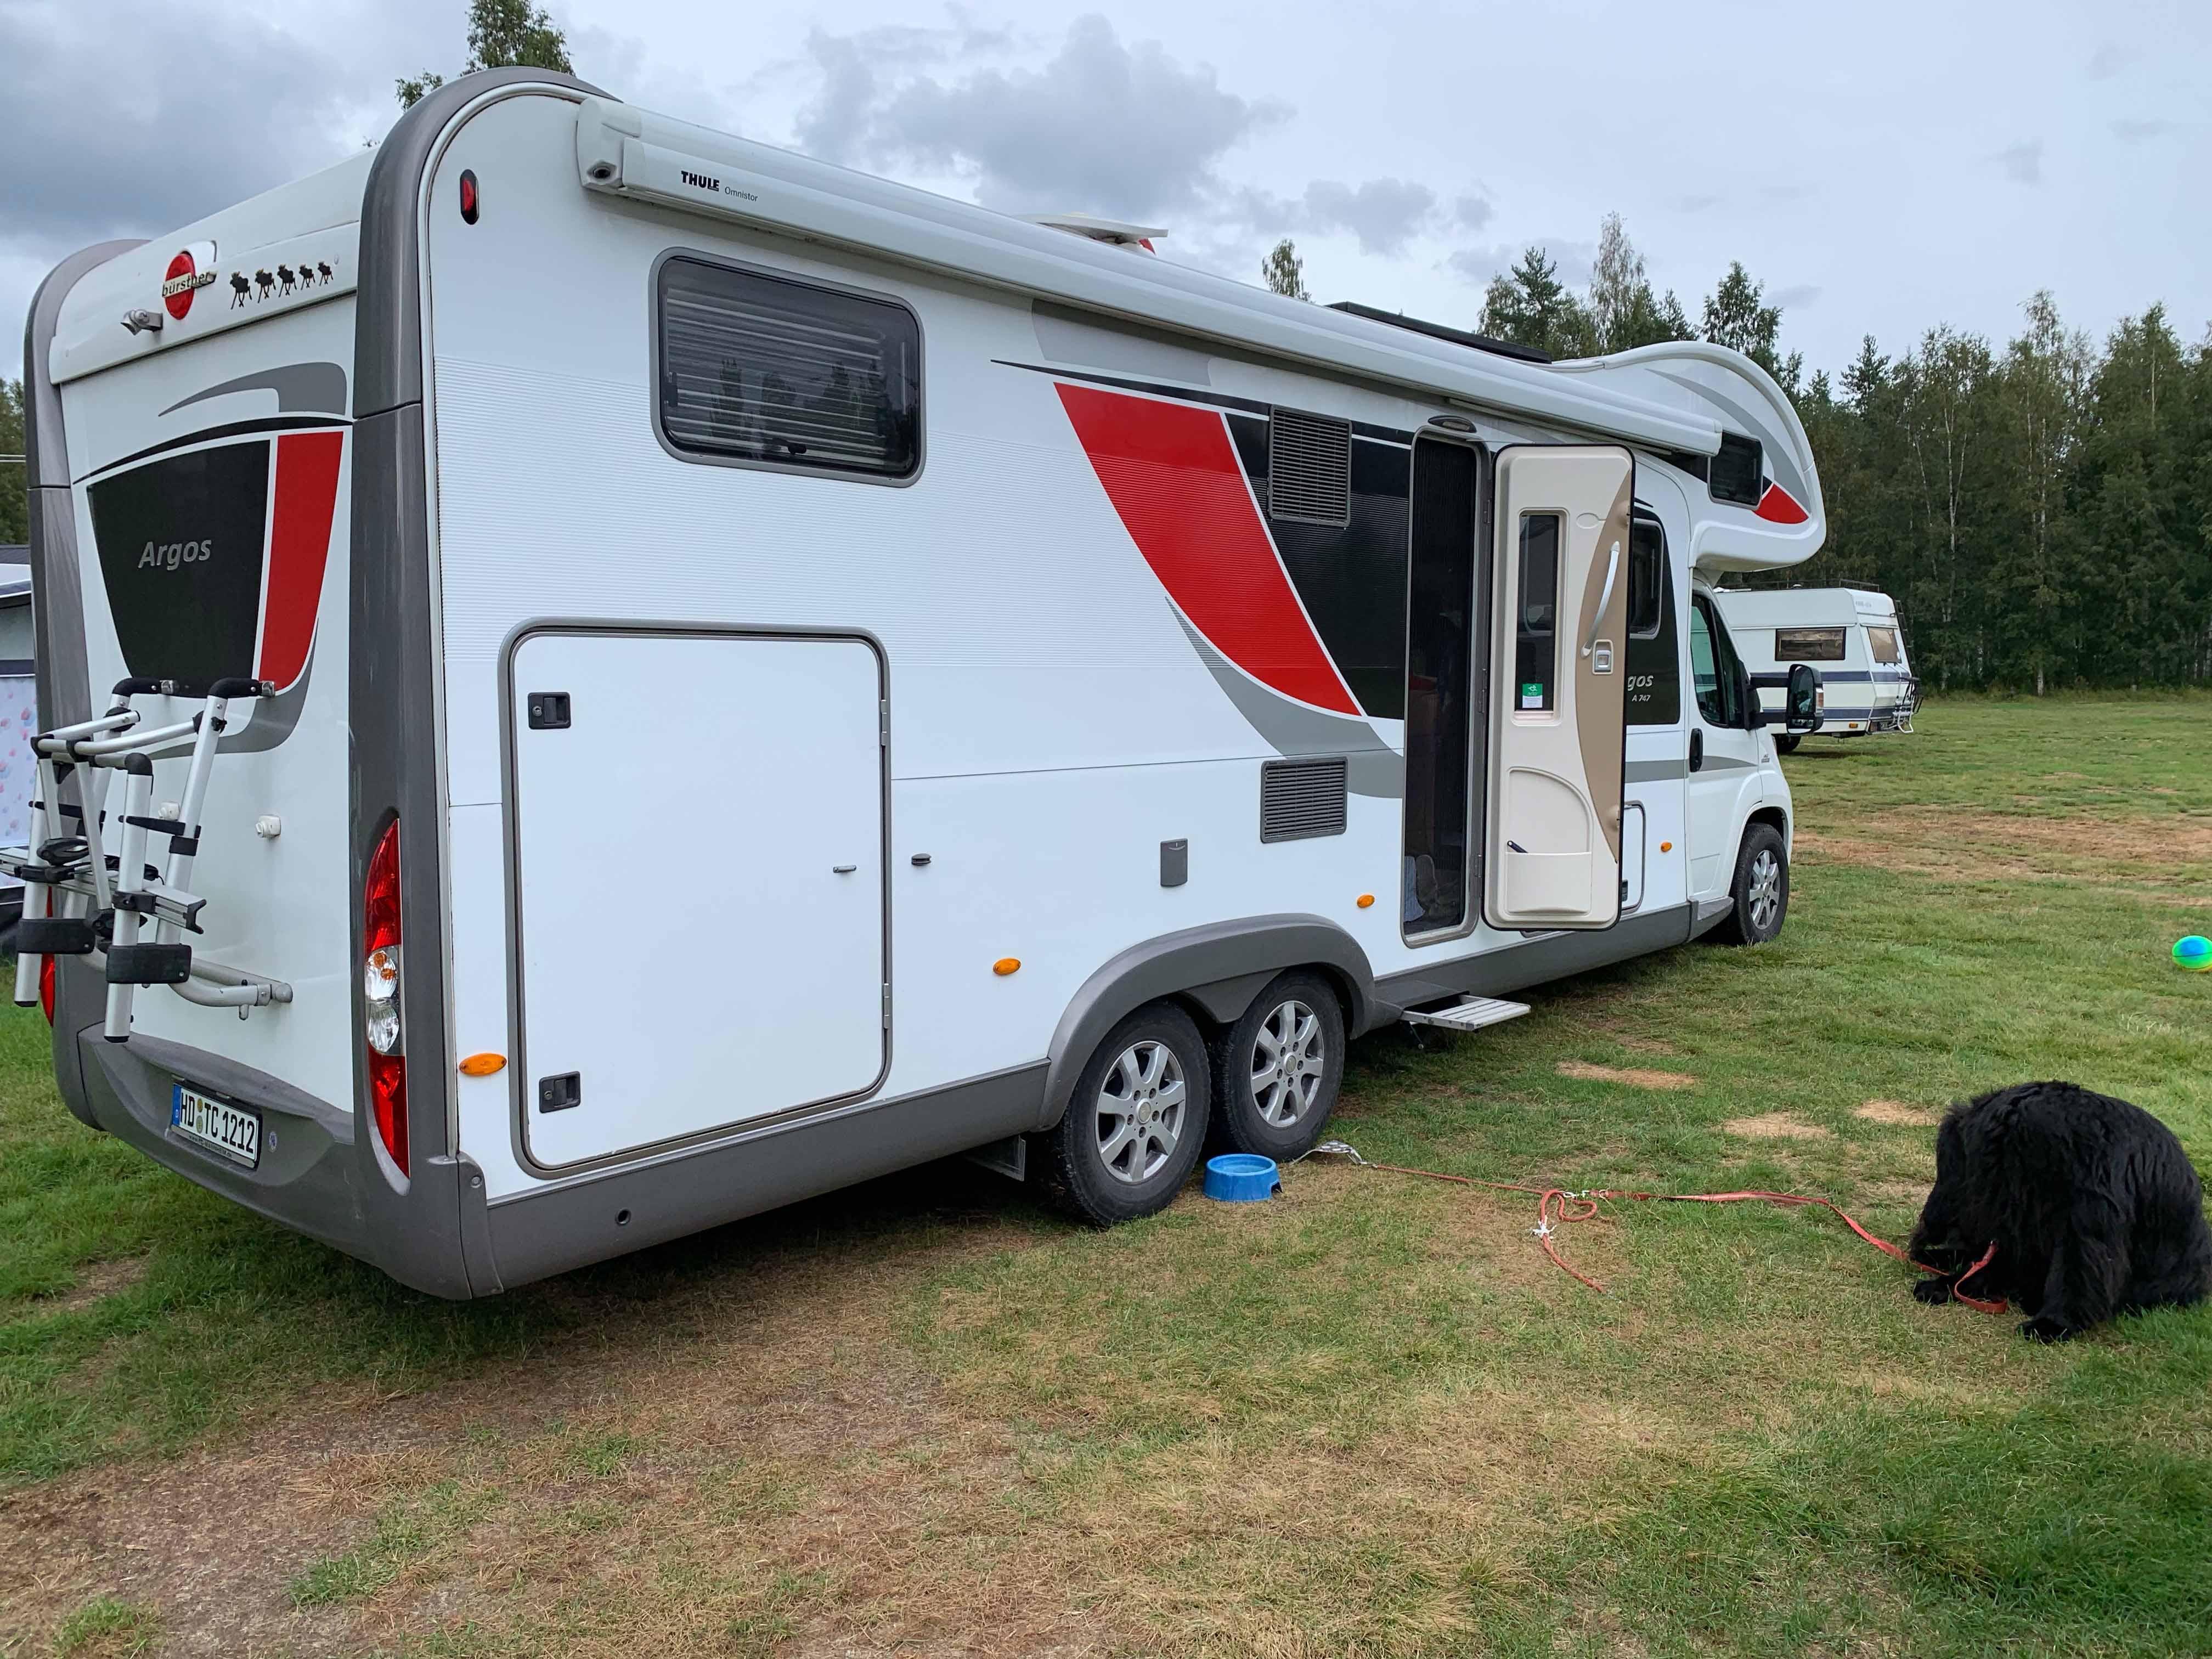 Våmåbadets_camping01